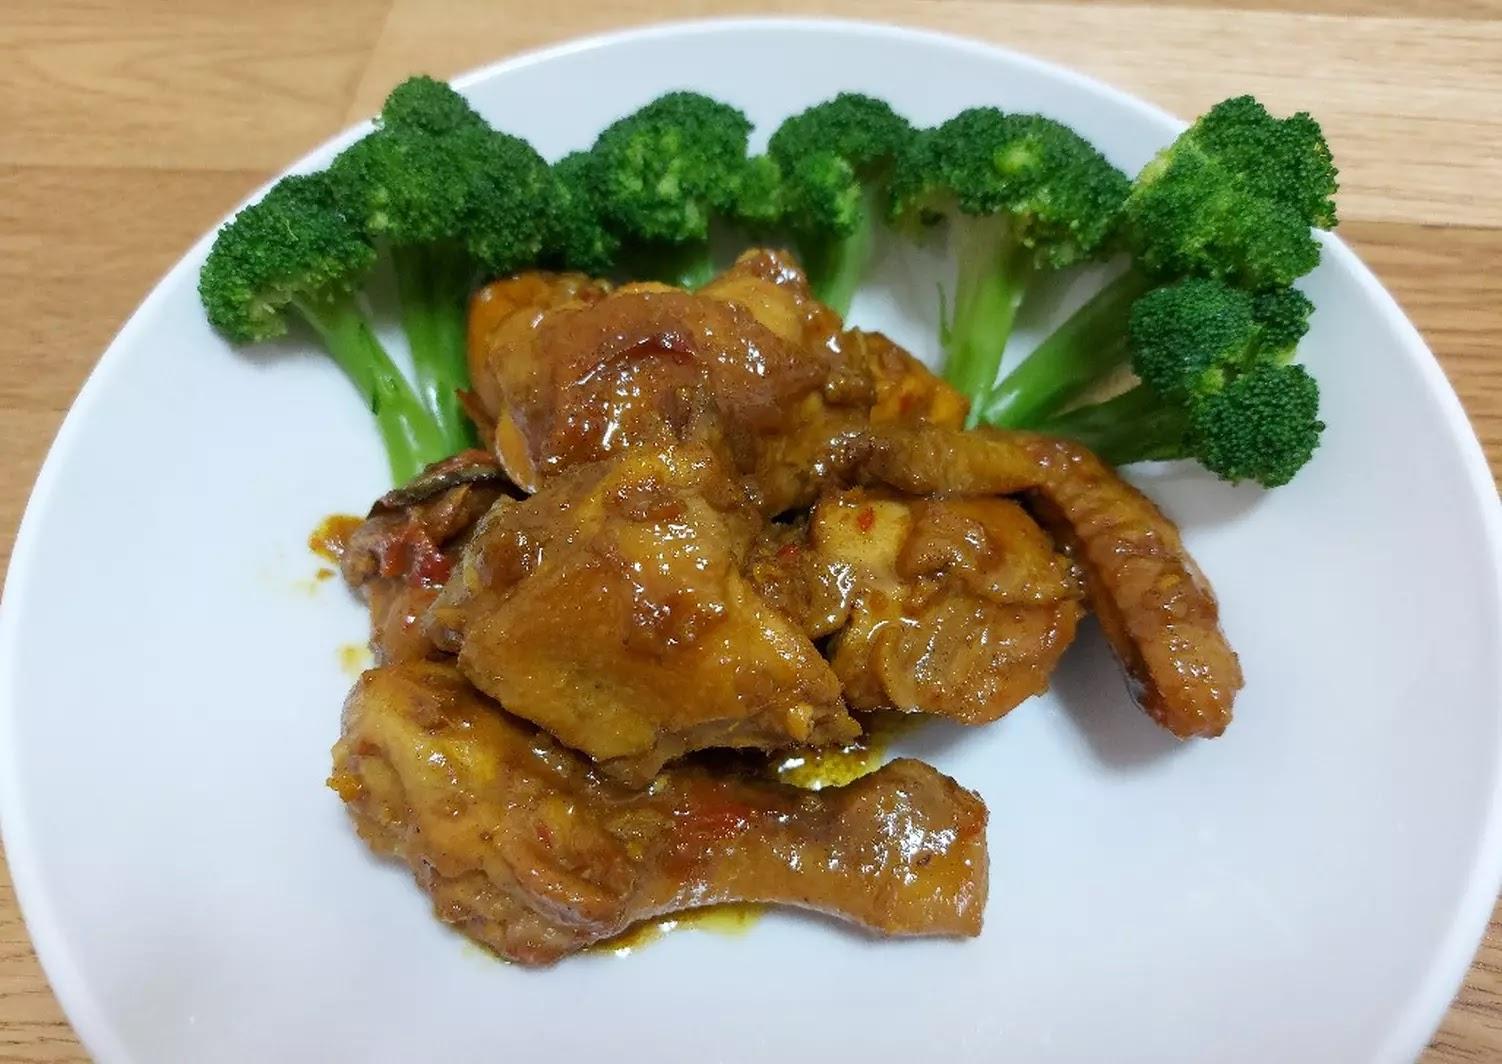 Resep Semur Ayam Kecap Paling Enak